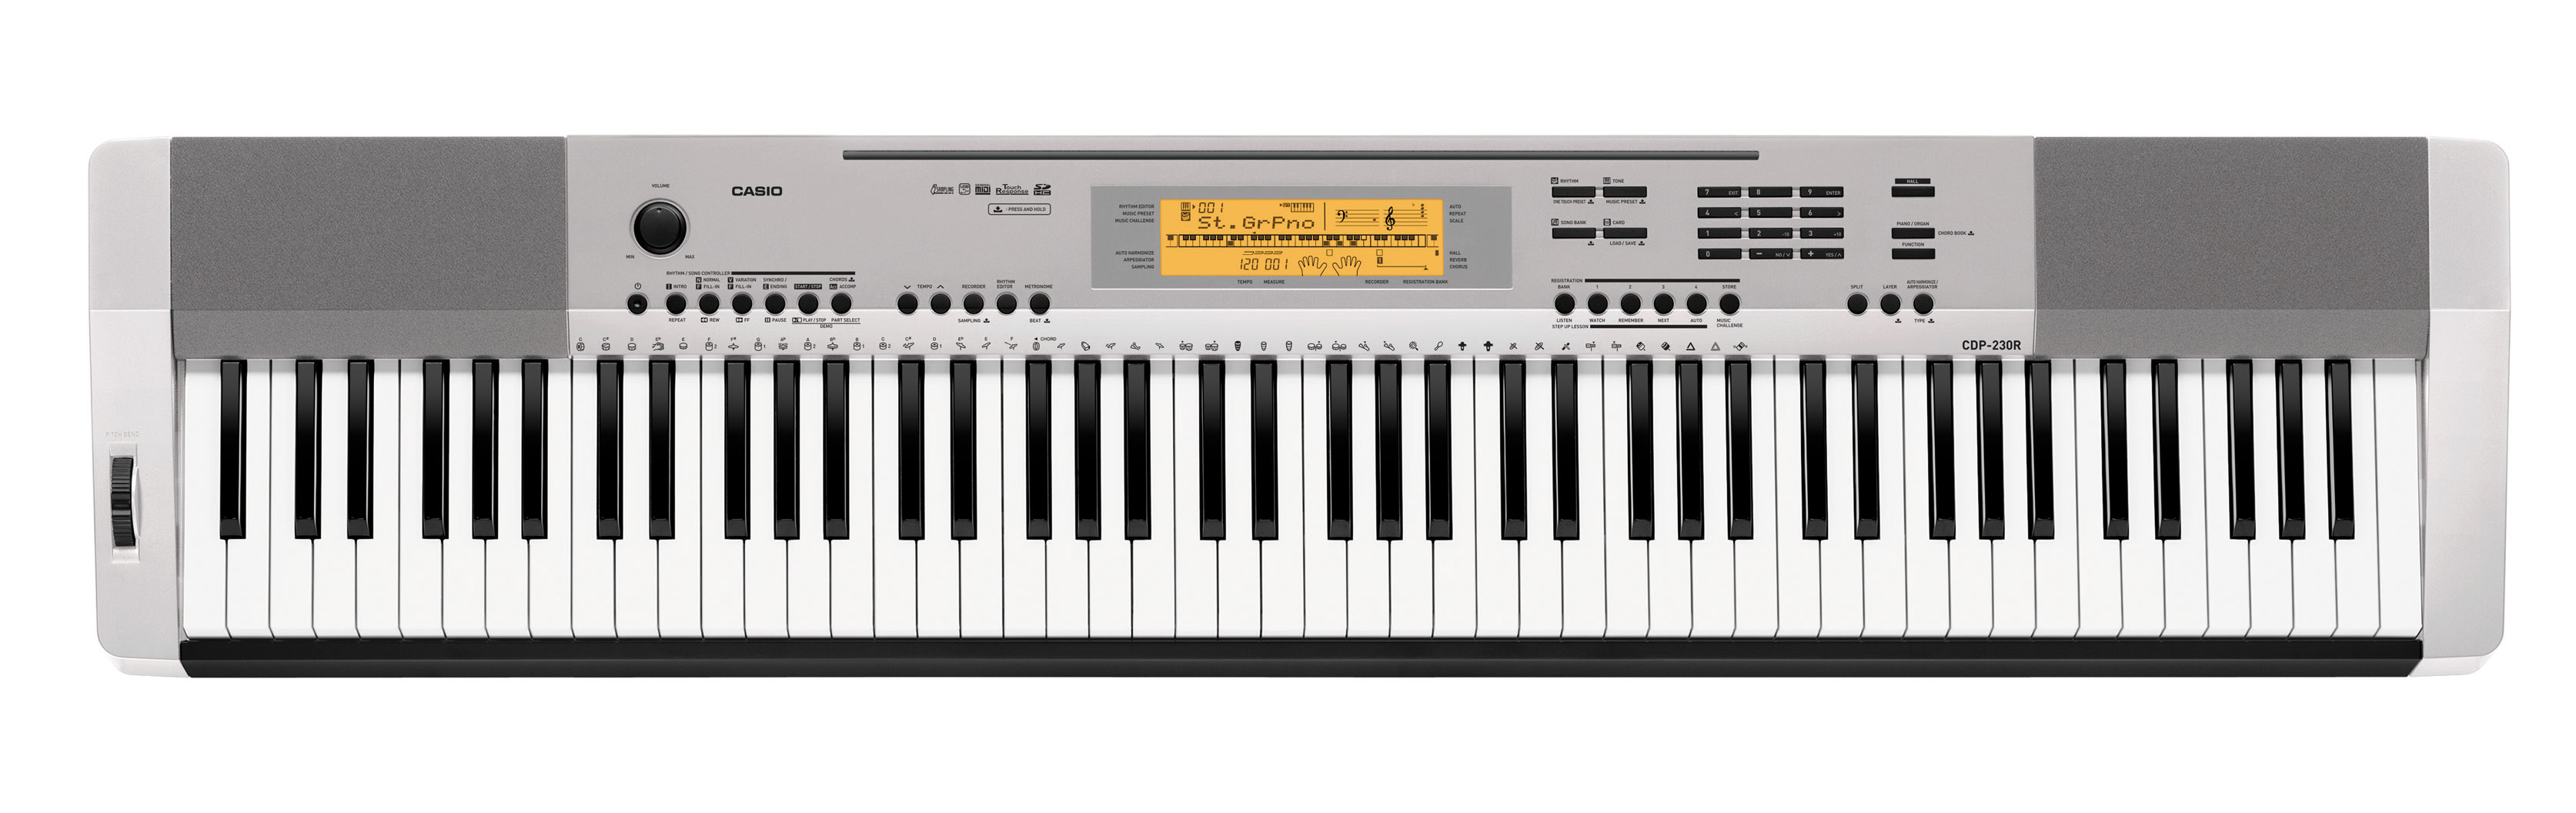 Цифровое пианино CASIO CDP-230R SR